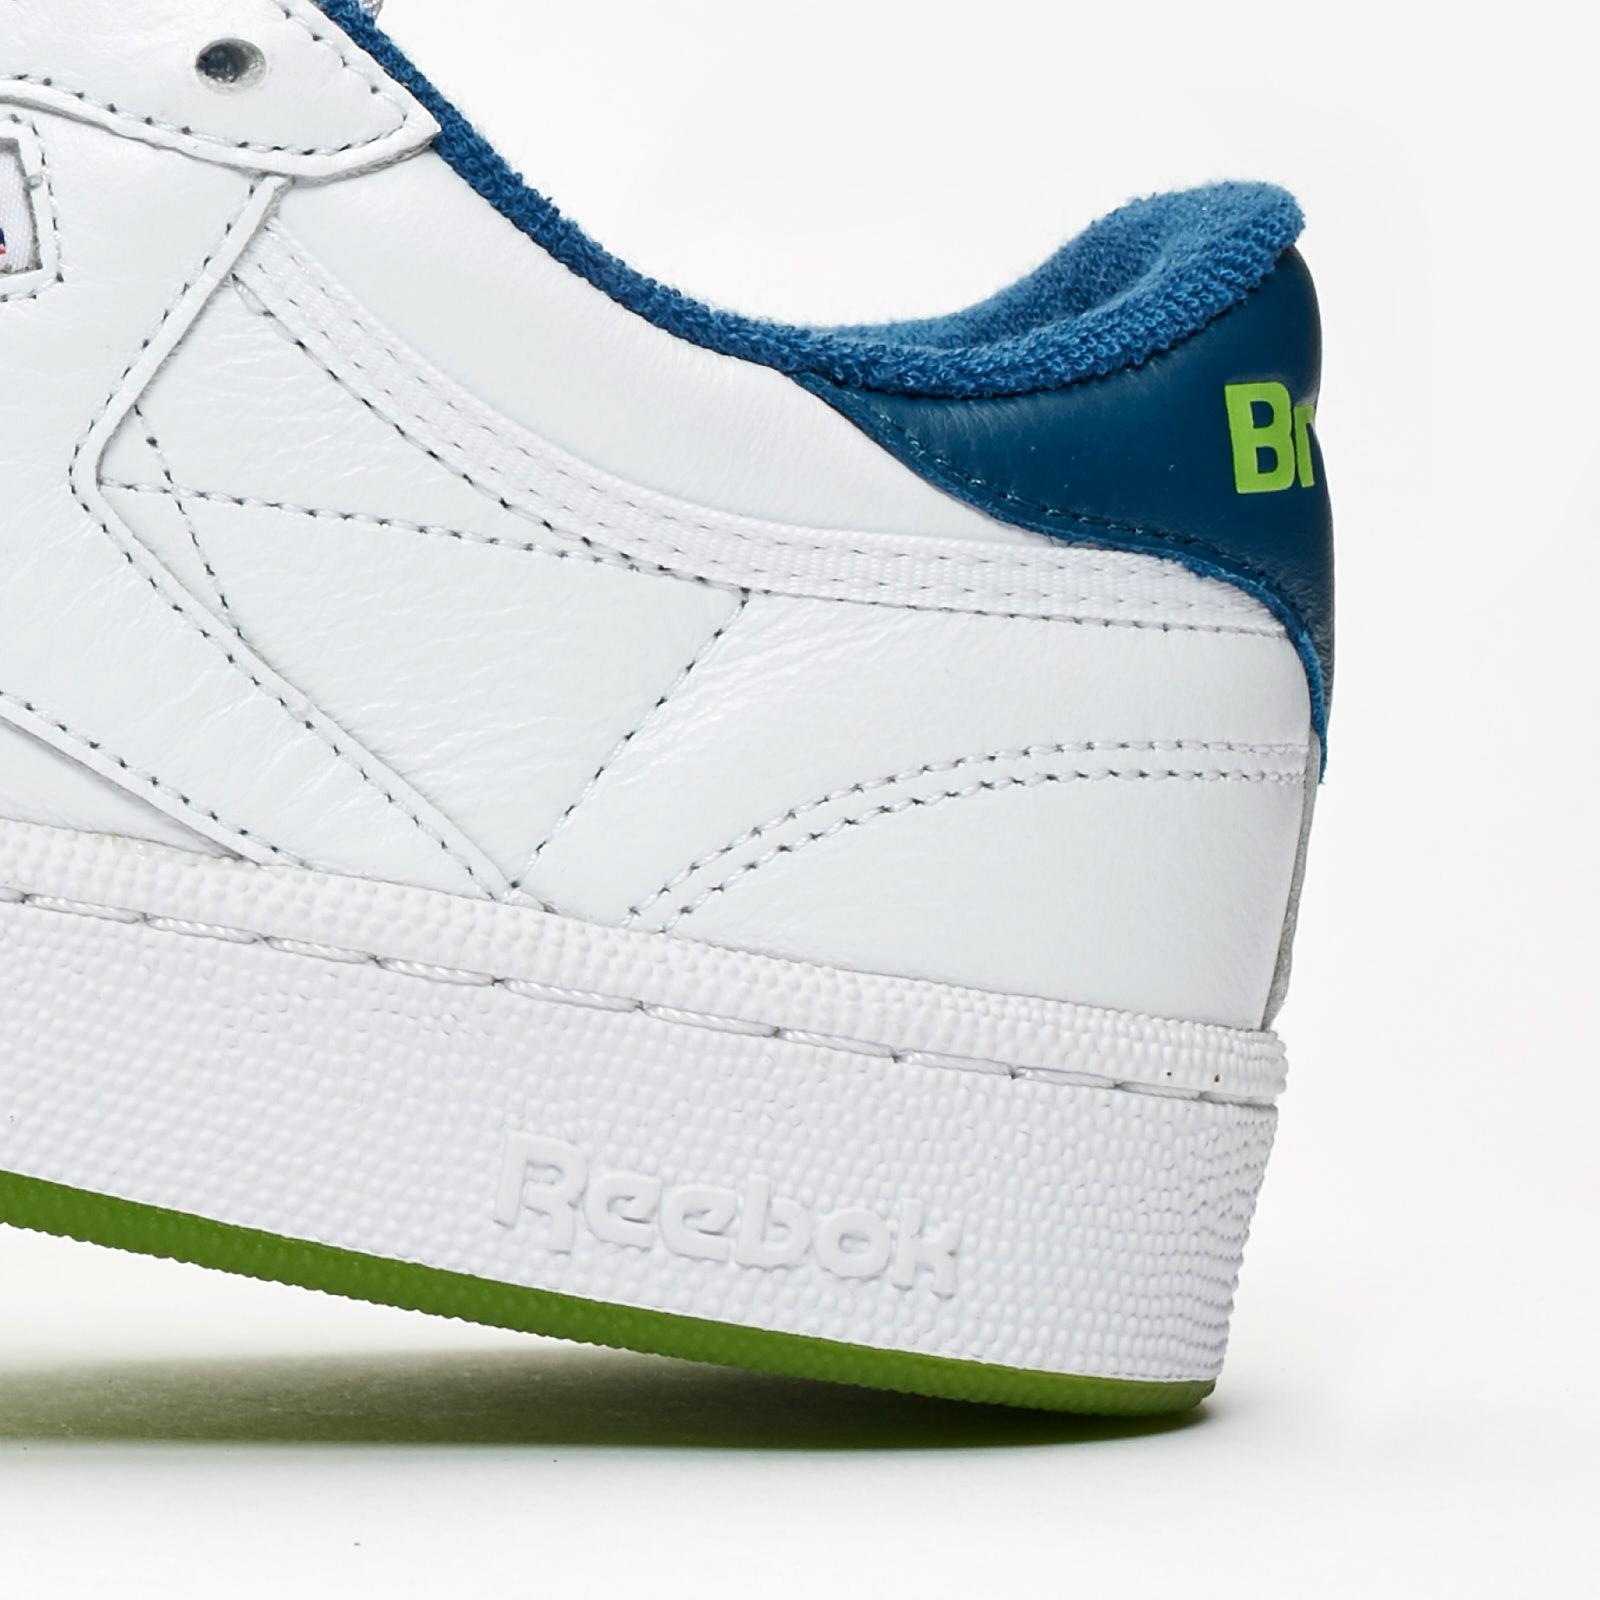 8c7c8b92942 Reebok Club C 85 x Bronze - Dv4822 - Sneakersnstuff